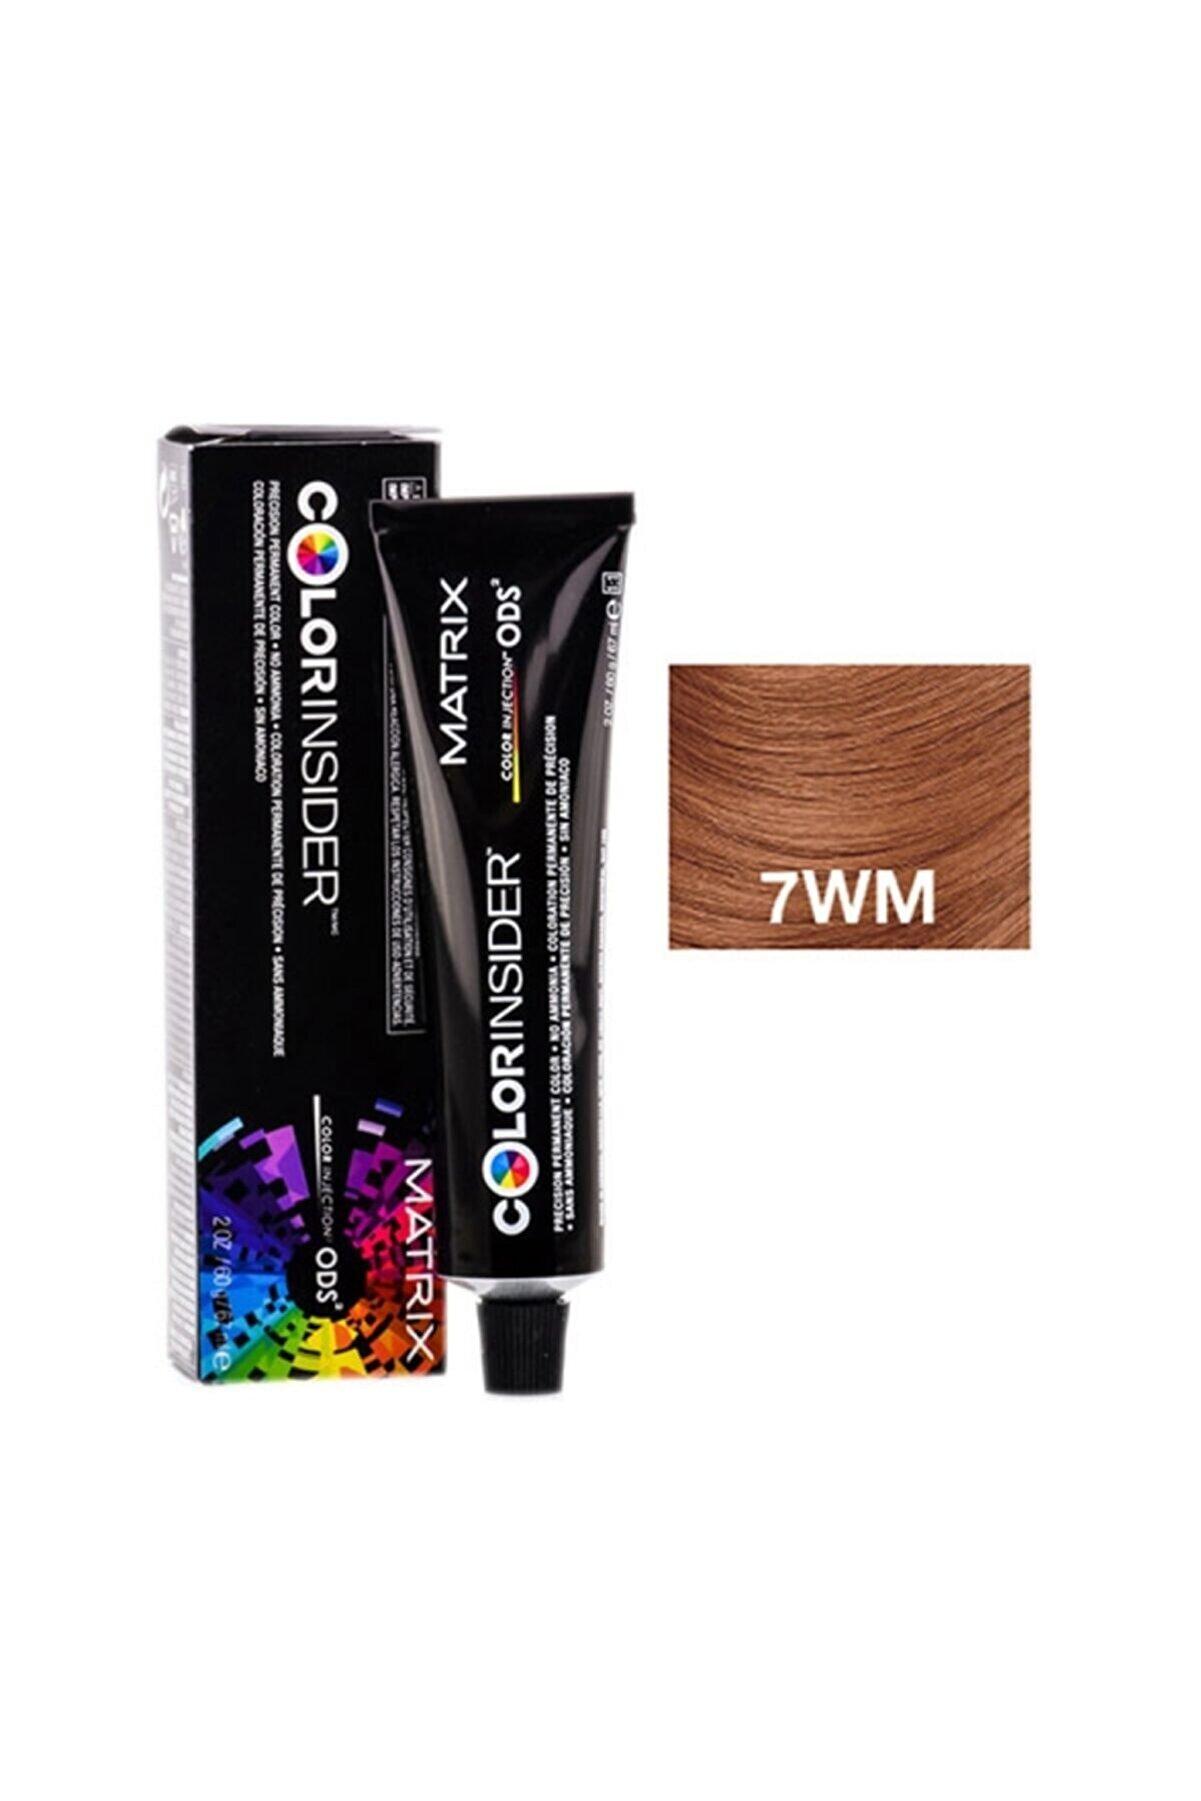 Matrix Color Insider 7wm Dark Blonde Warm Mocha Permanent Color